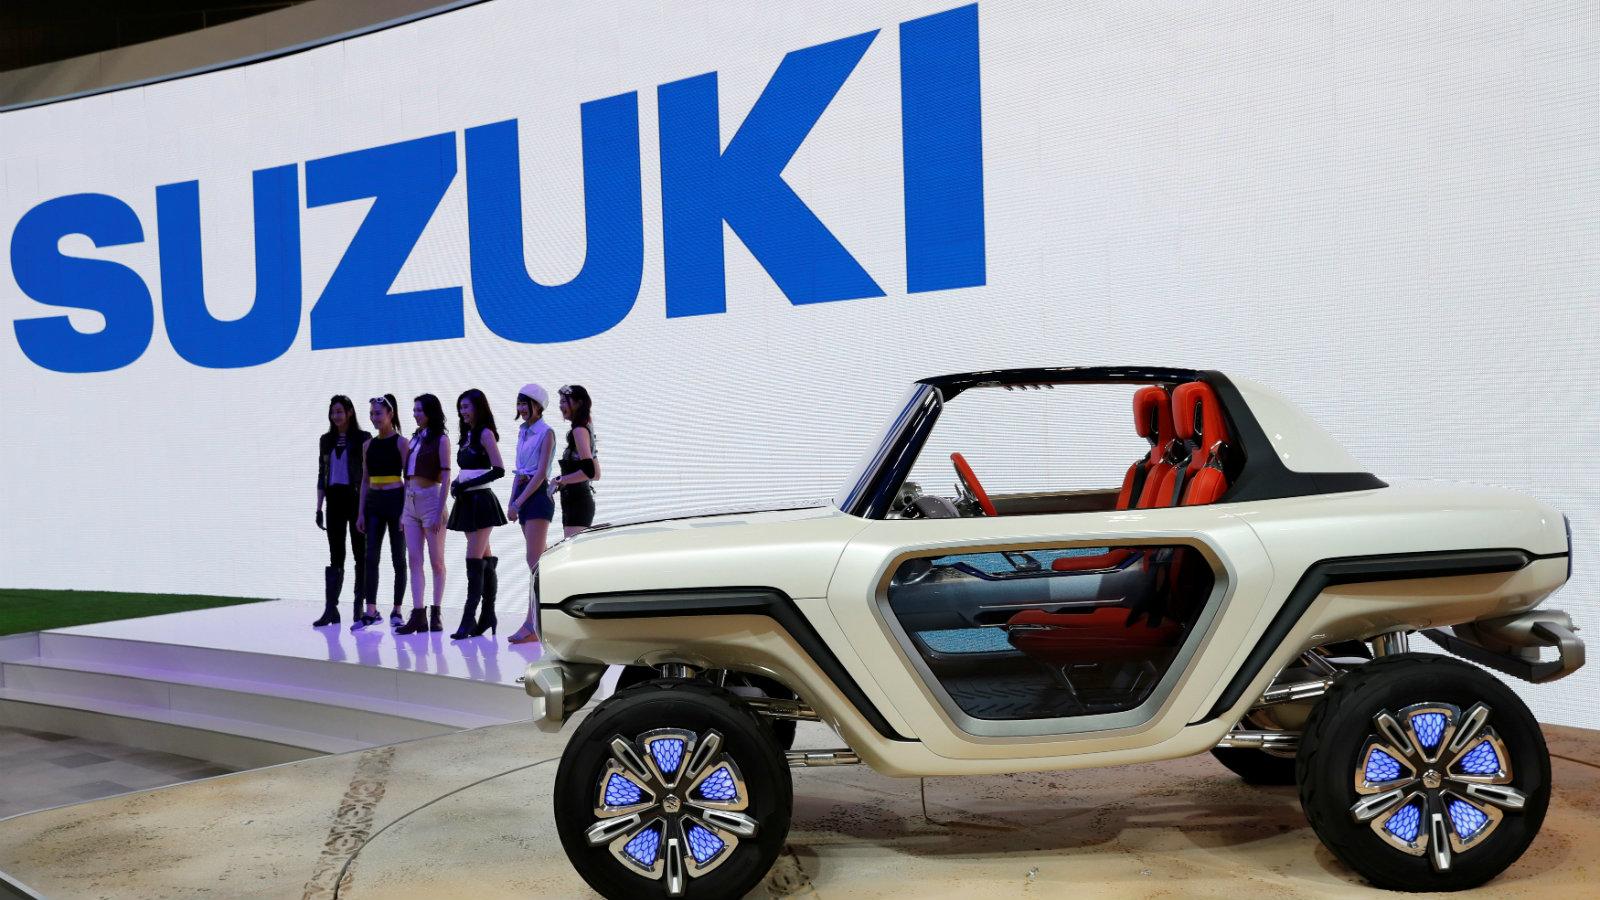 Suzuki Motor's EV e-Survivor concept at the media preview of the 45th Tokyo Motor Show in Tokyo, Japan, Oct. 25, 2017.